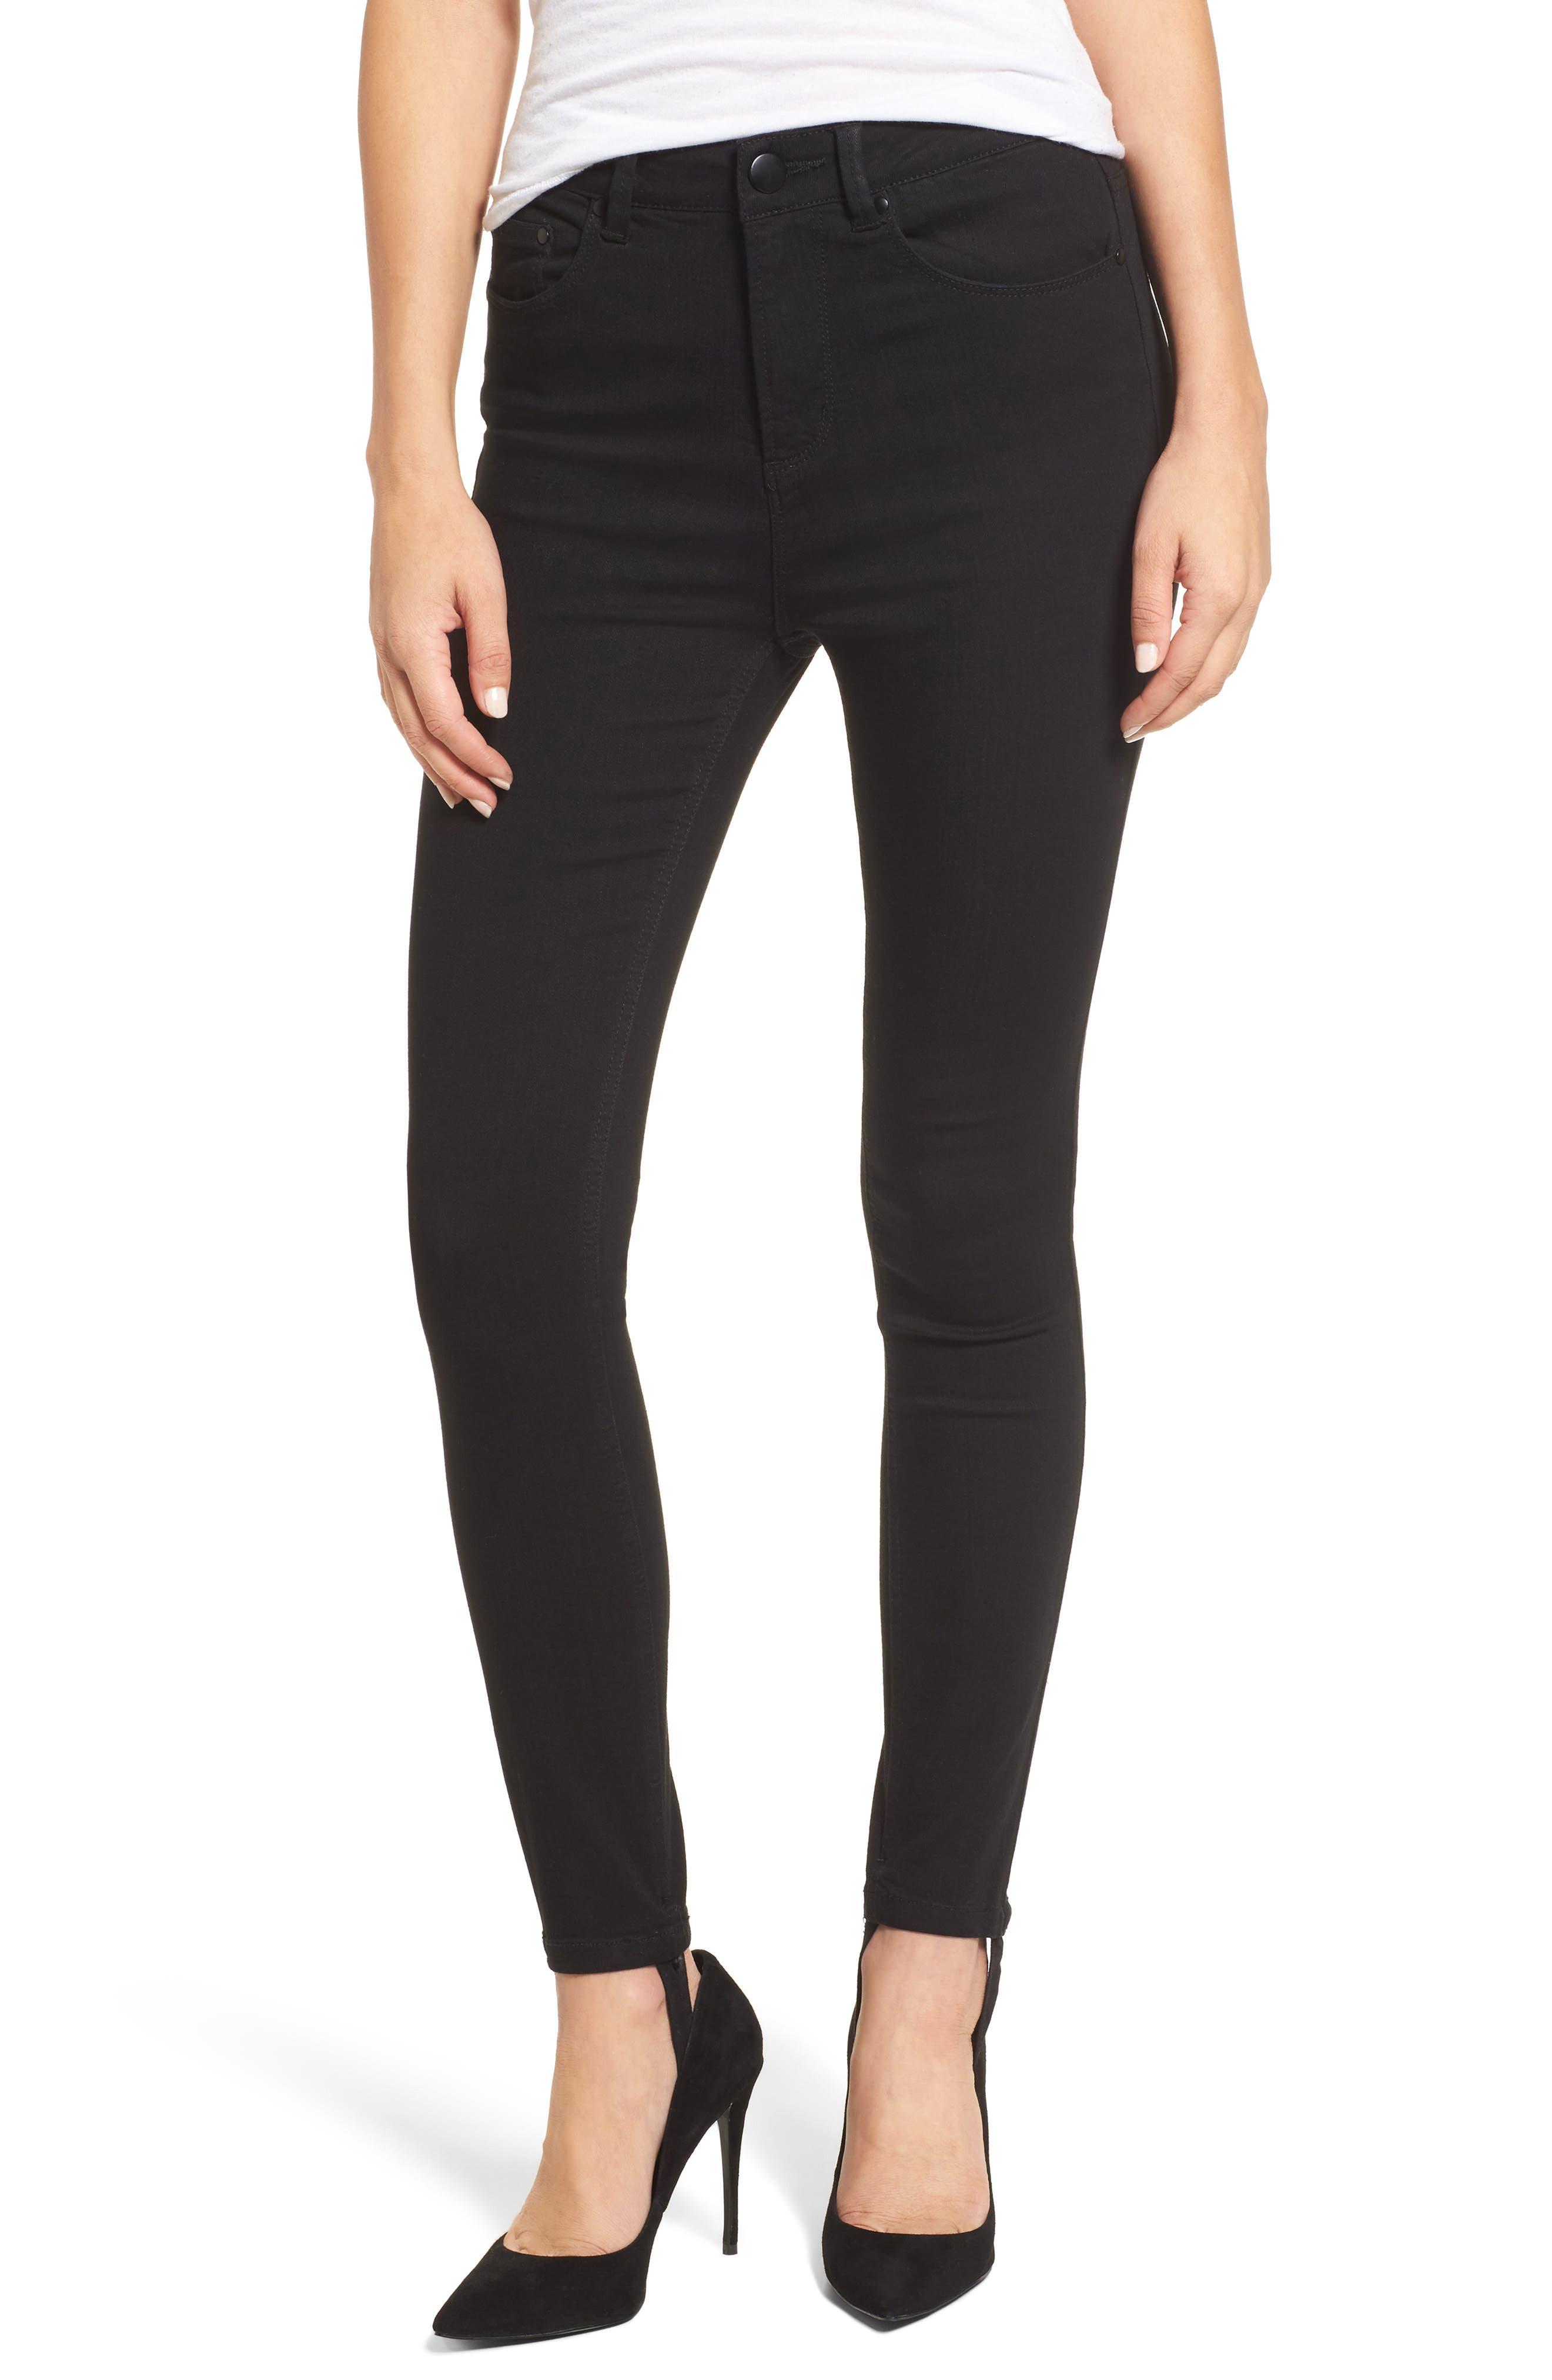 Luma High Waist Skinny Stirrup Jeans,                             Main thumbnail 1, color,                             002